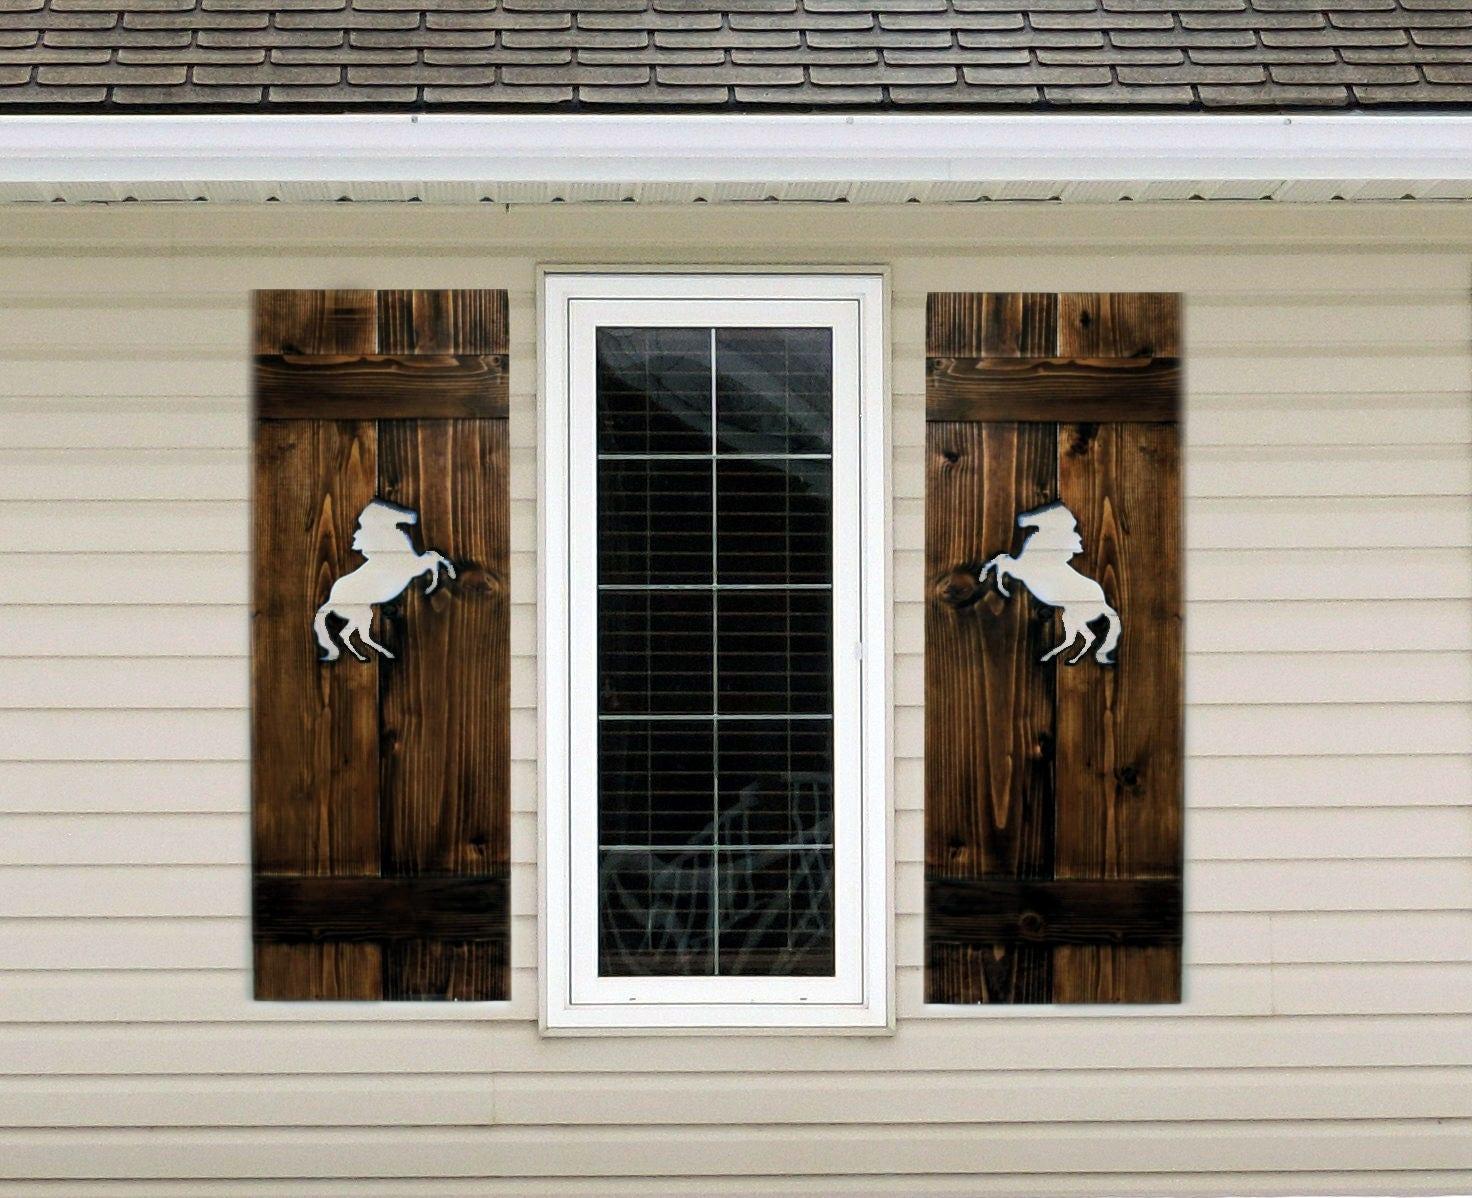 Rustic wood shutter exterior shutters interior shutters for Exterior wood louvers